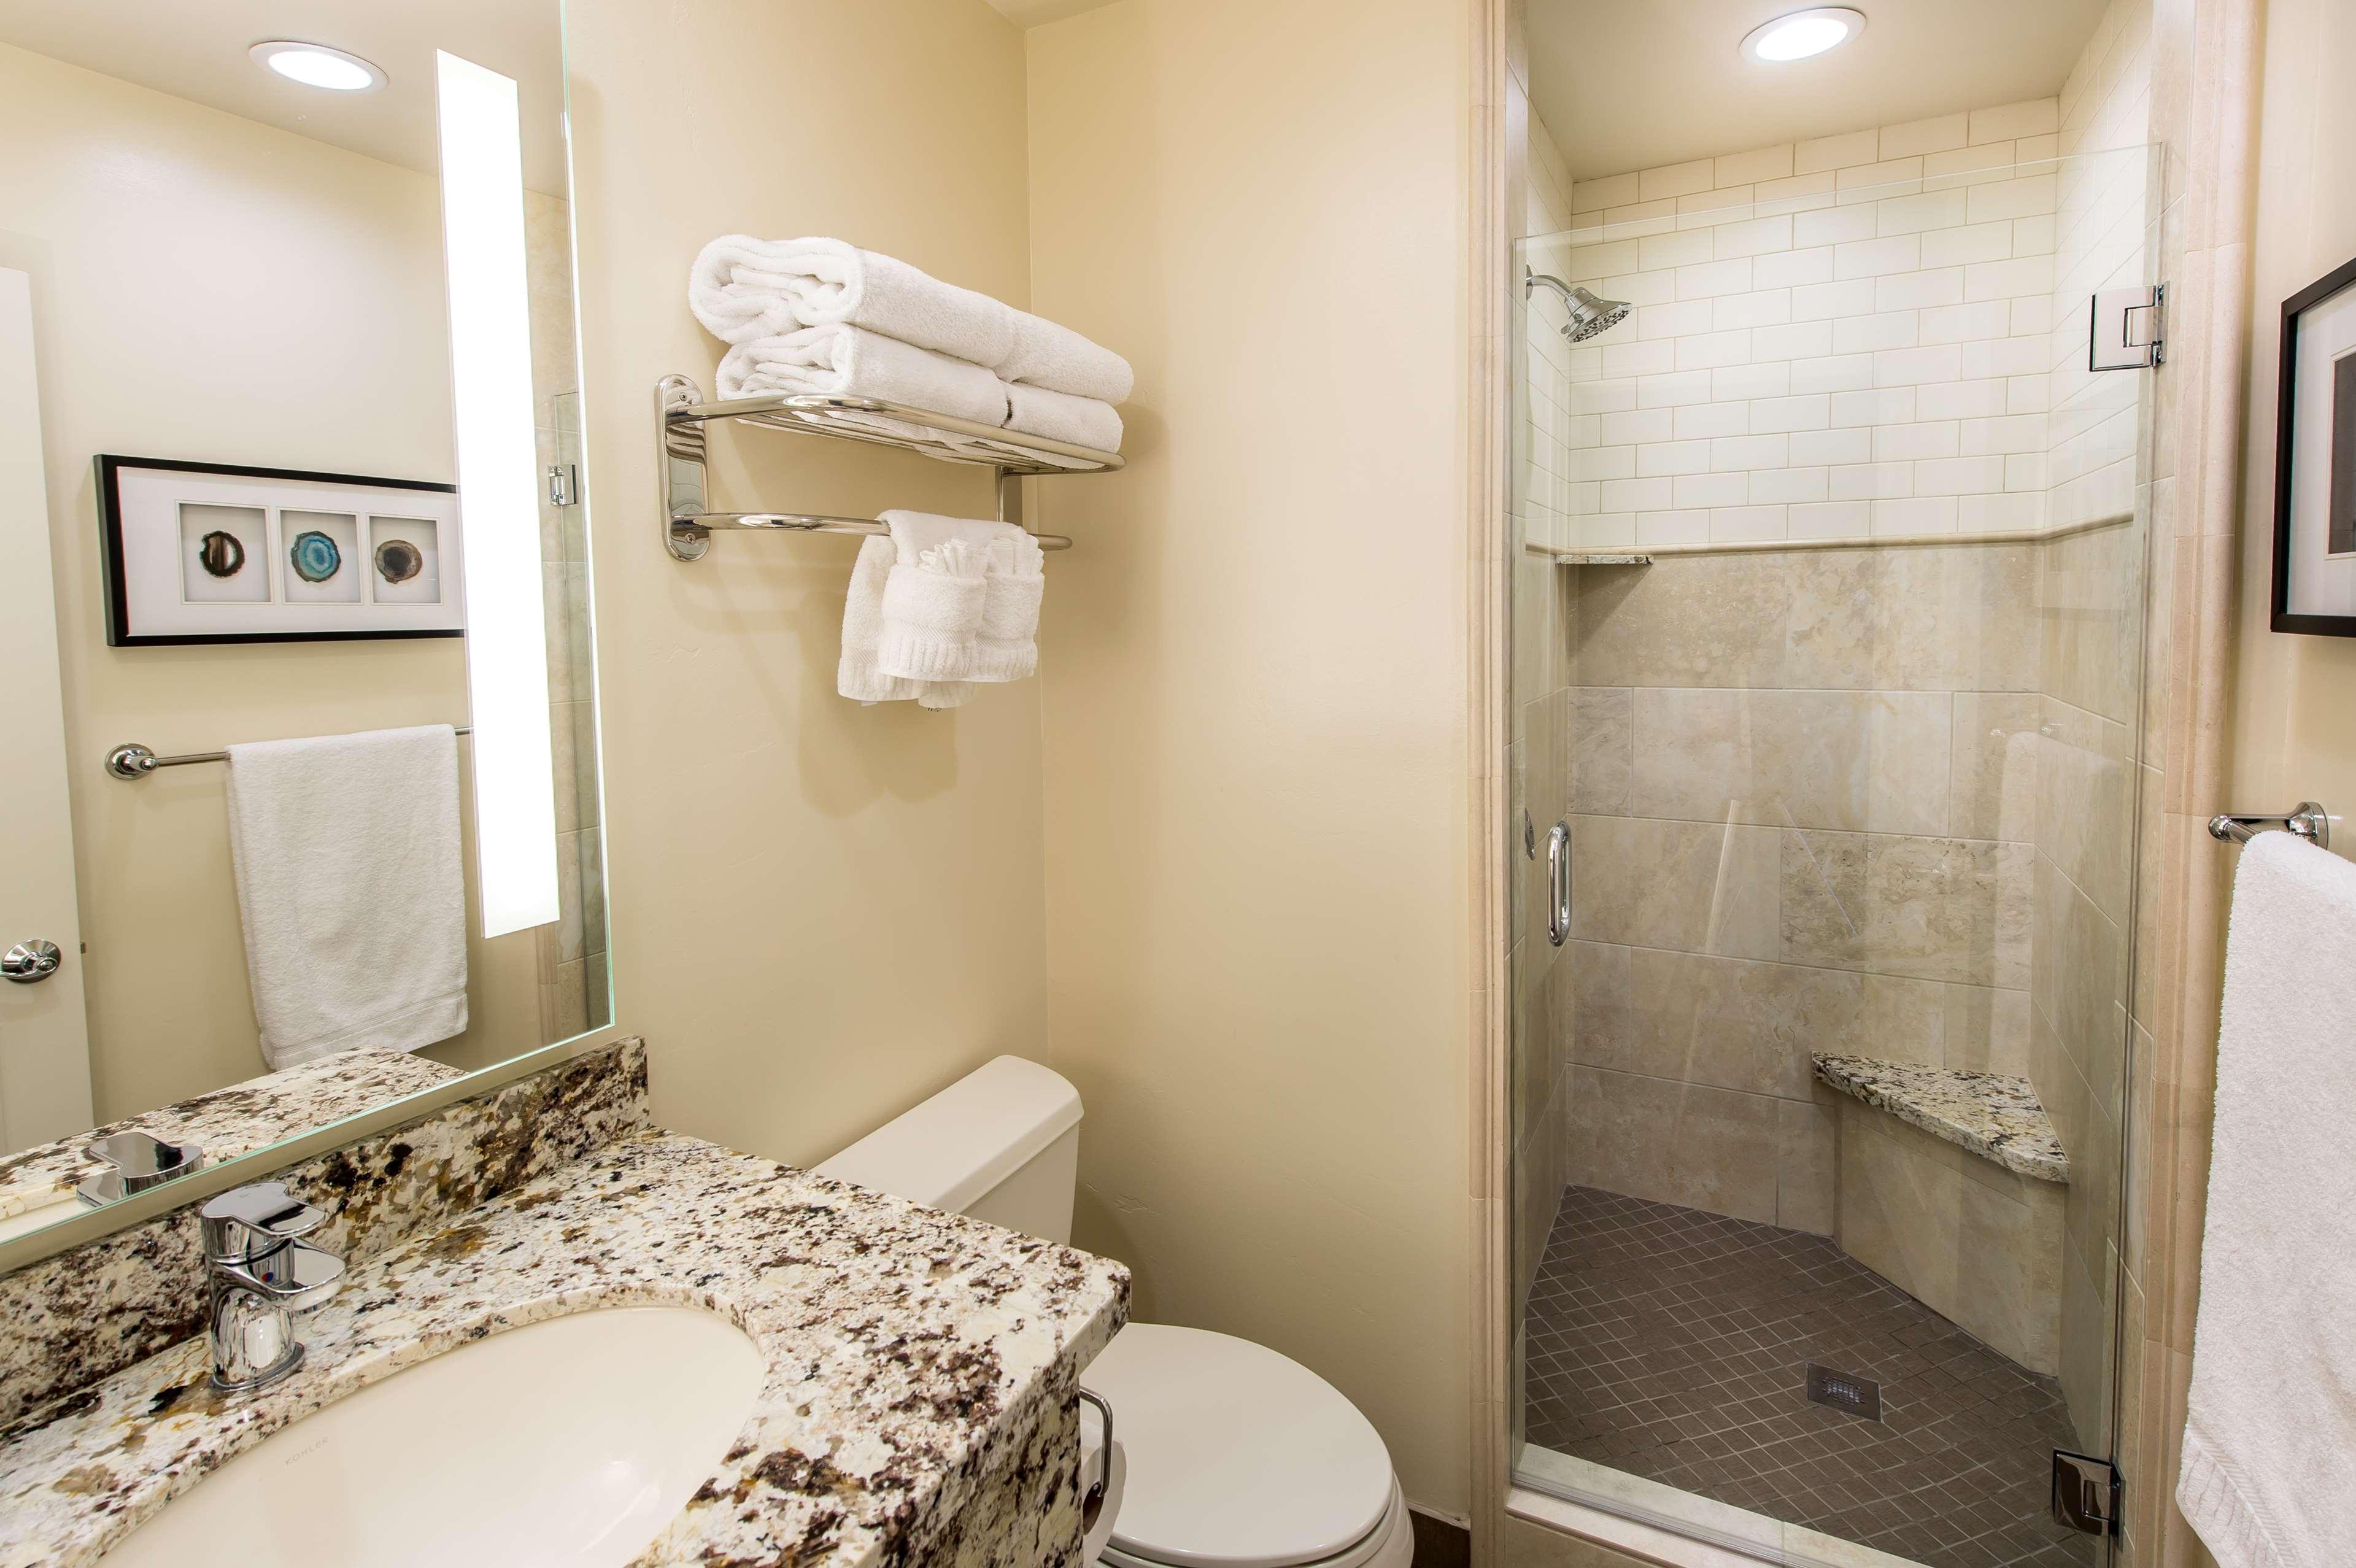 Best Western Plus Arroyo Roble Hotel & Creekside Villas image 33